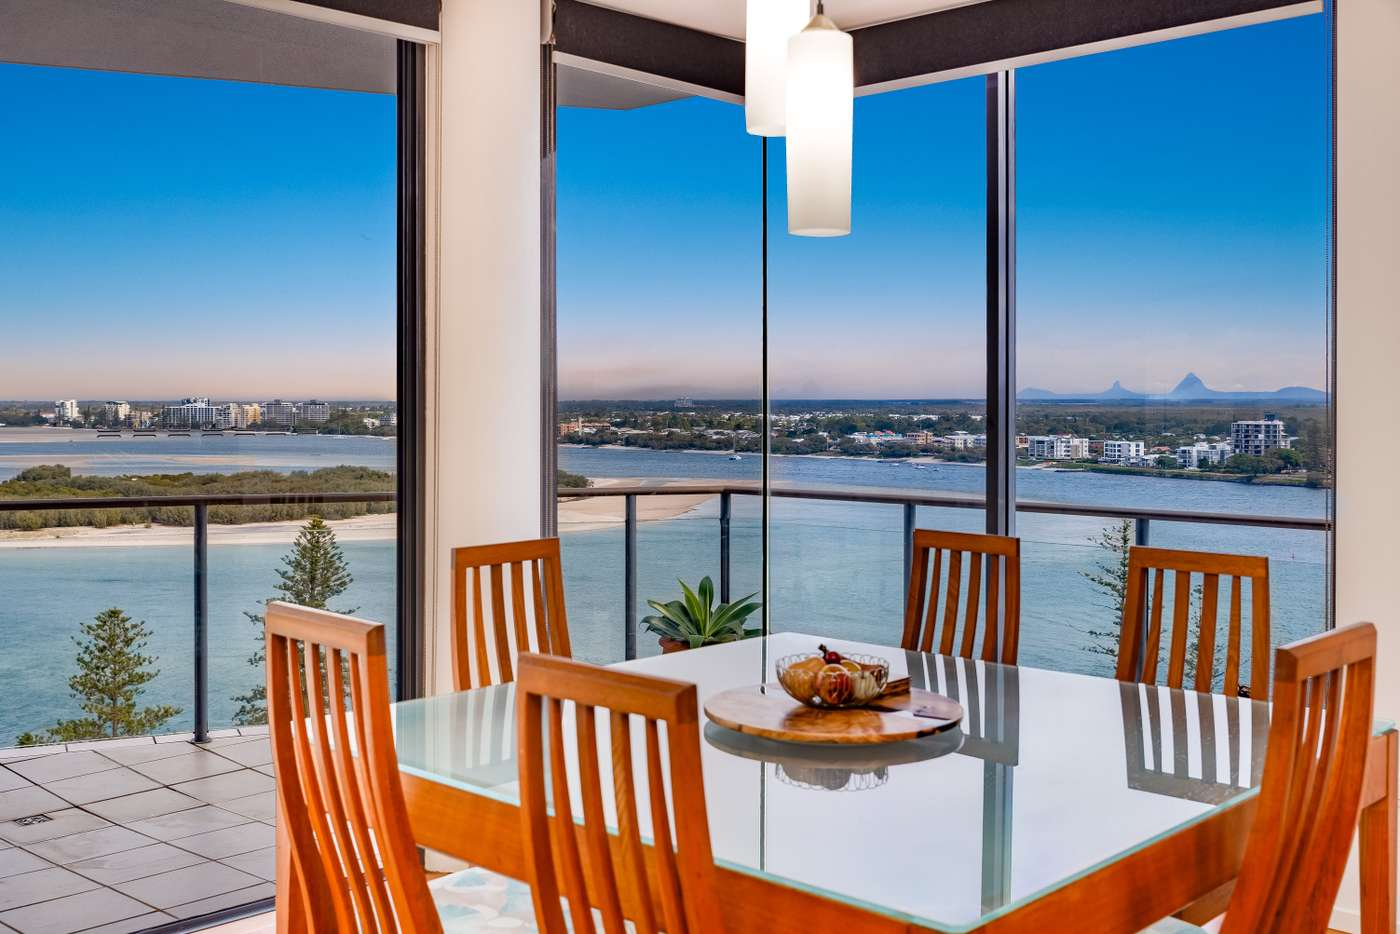 Main view of Homely unit listing, Unit 1201/17 Leeding Terrace, Caloundra QLD 4551